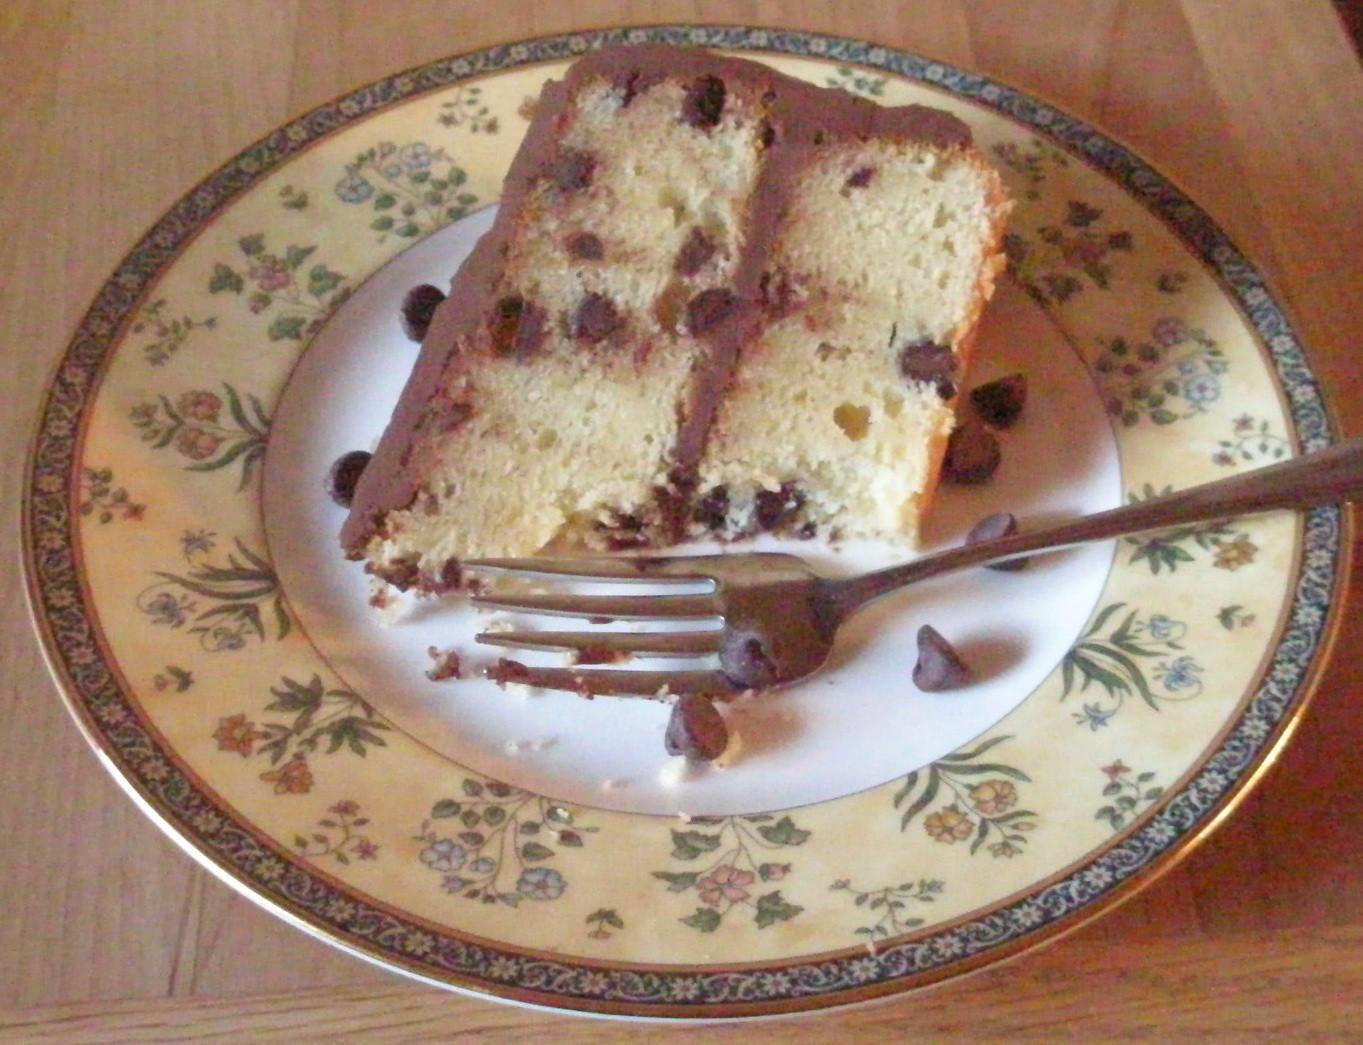 Gluten Free Sour Cream Pound Cake  Chocolate Chip Pound Cake with Chocolate Sour Cream